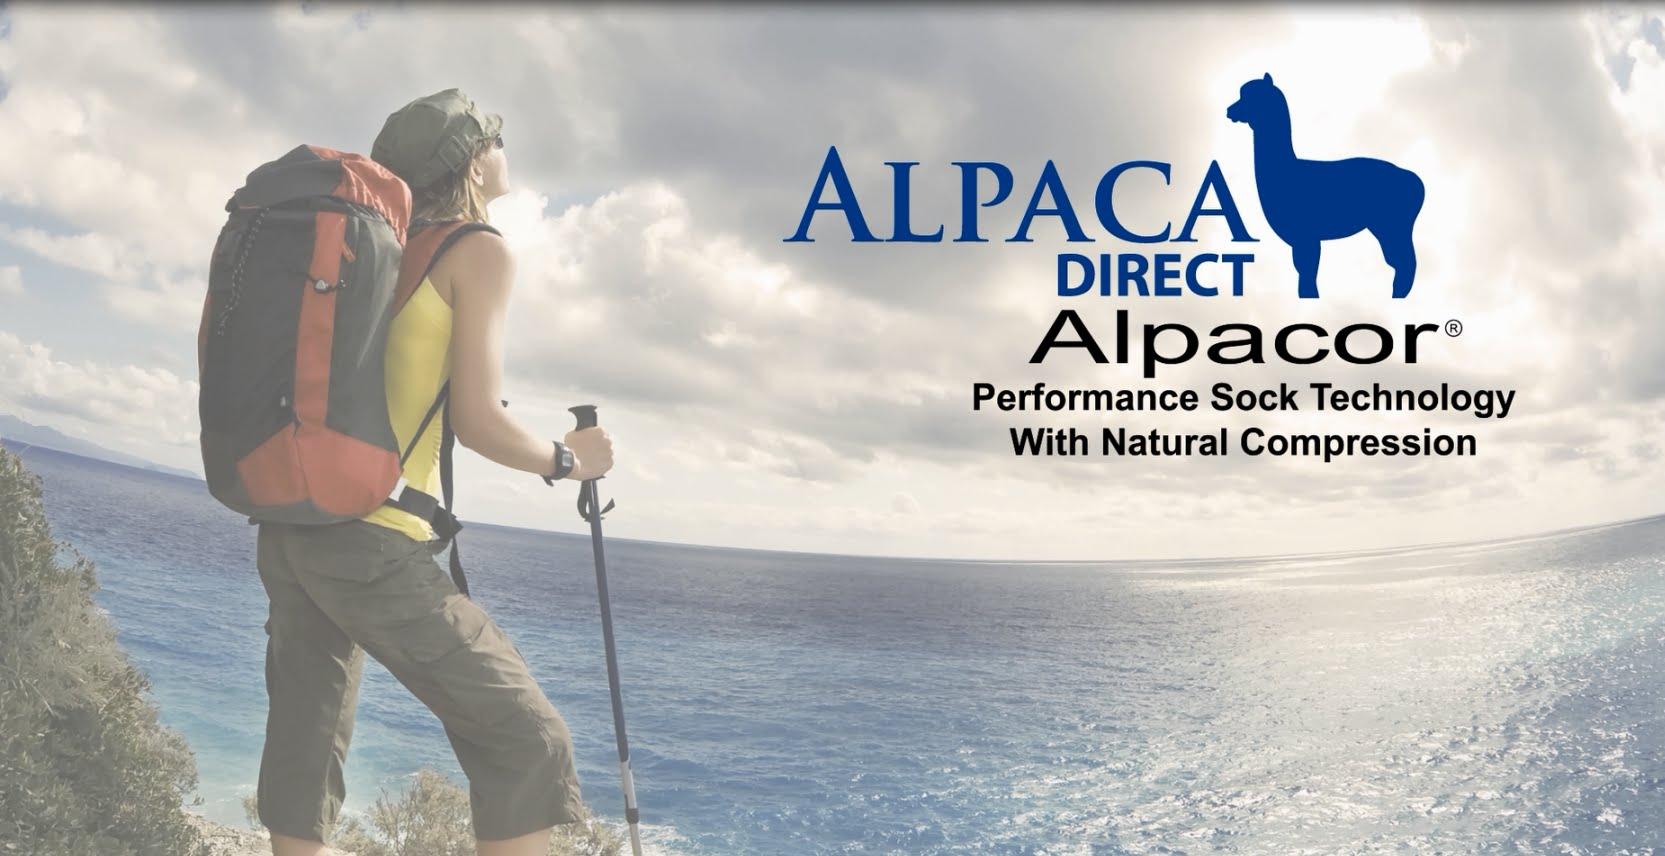 Alpaca Direct 10% Off + Free Shipping APO/FPO